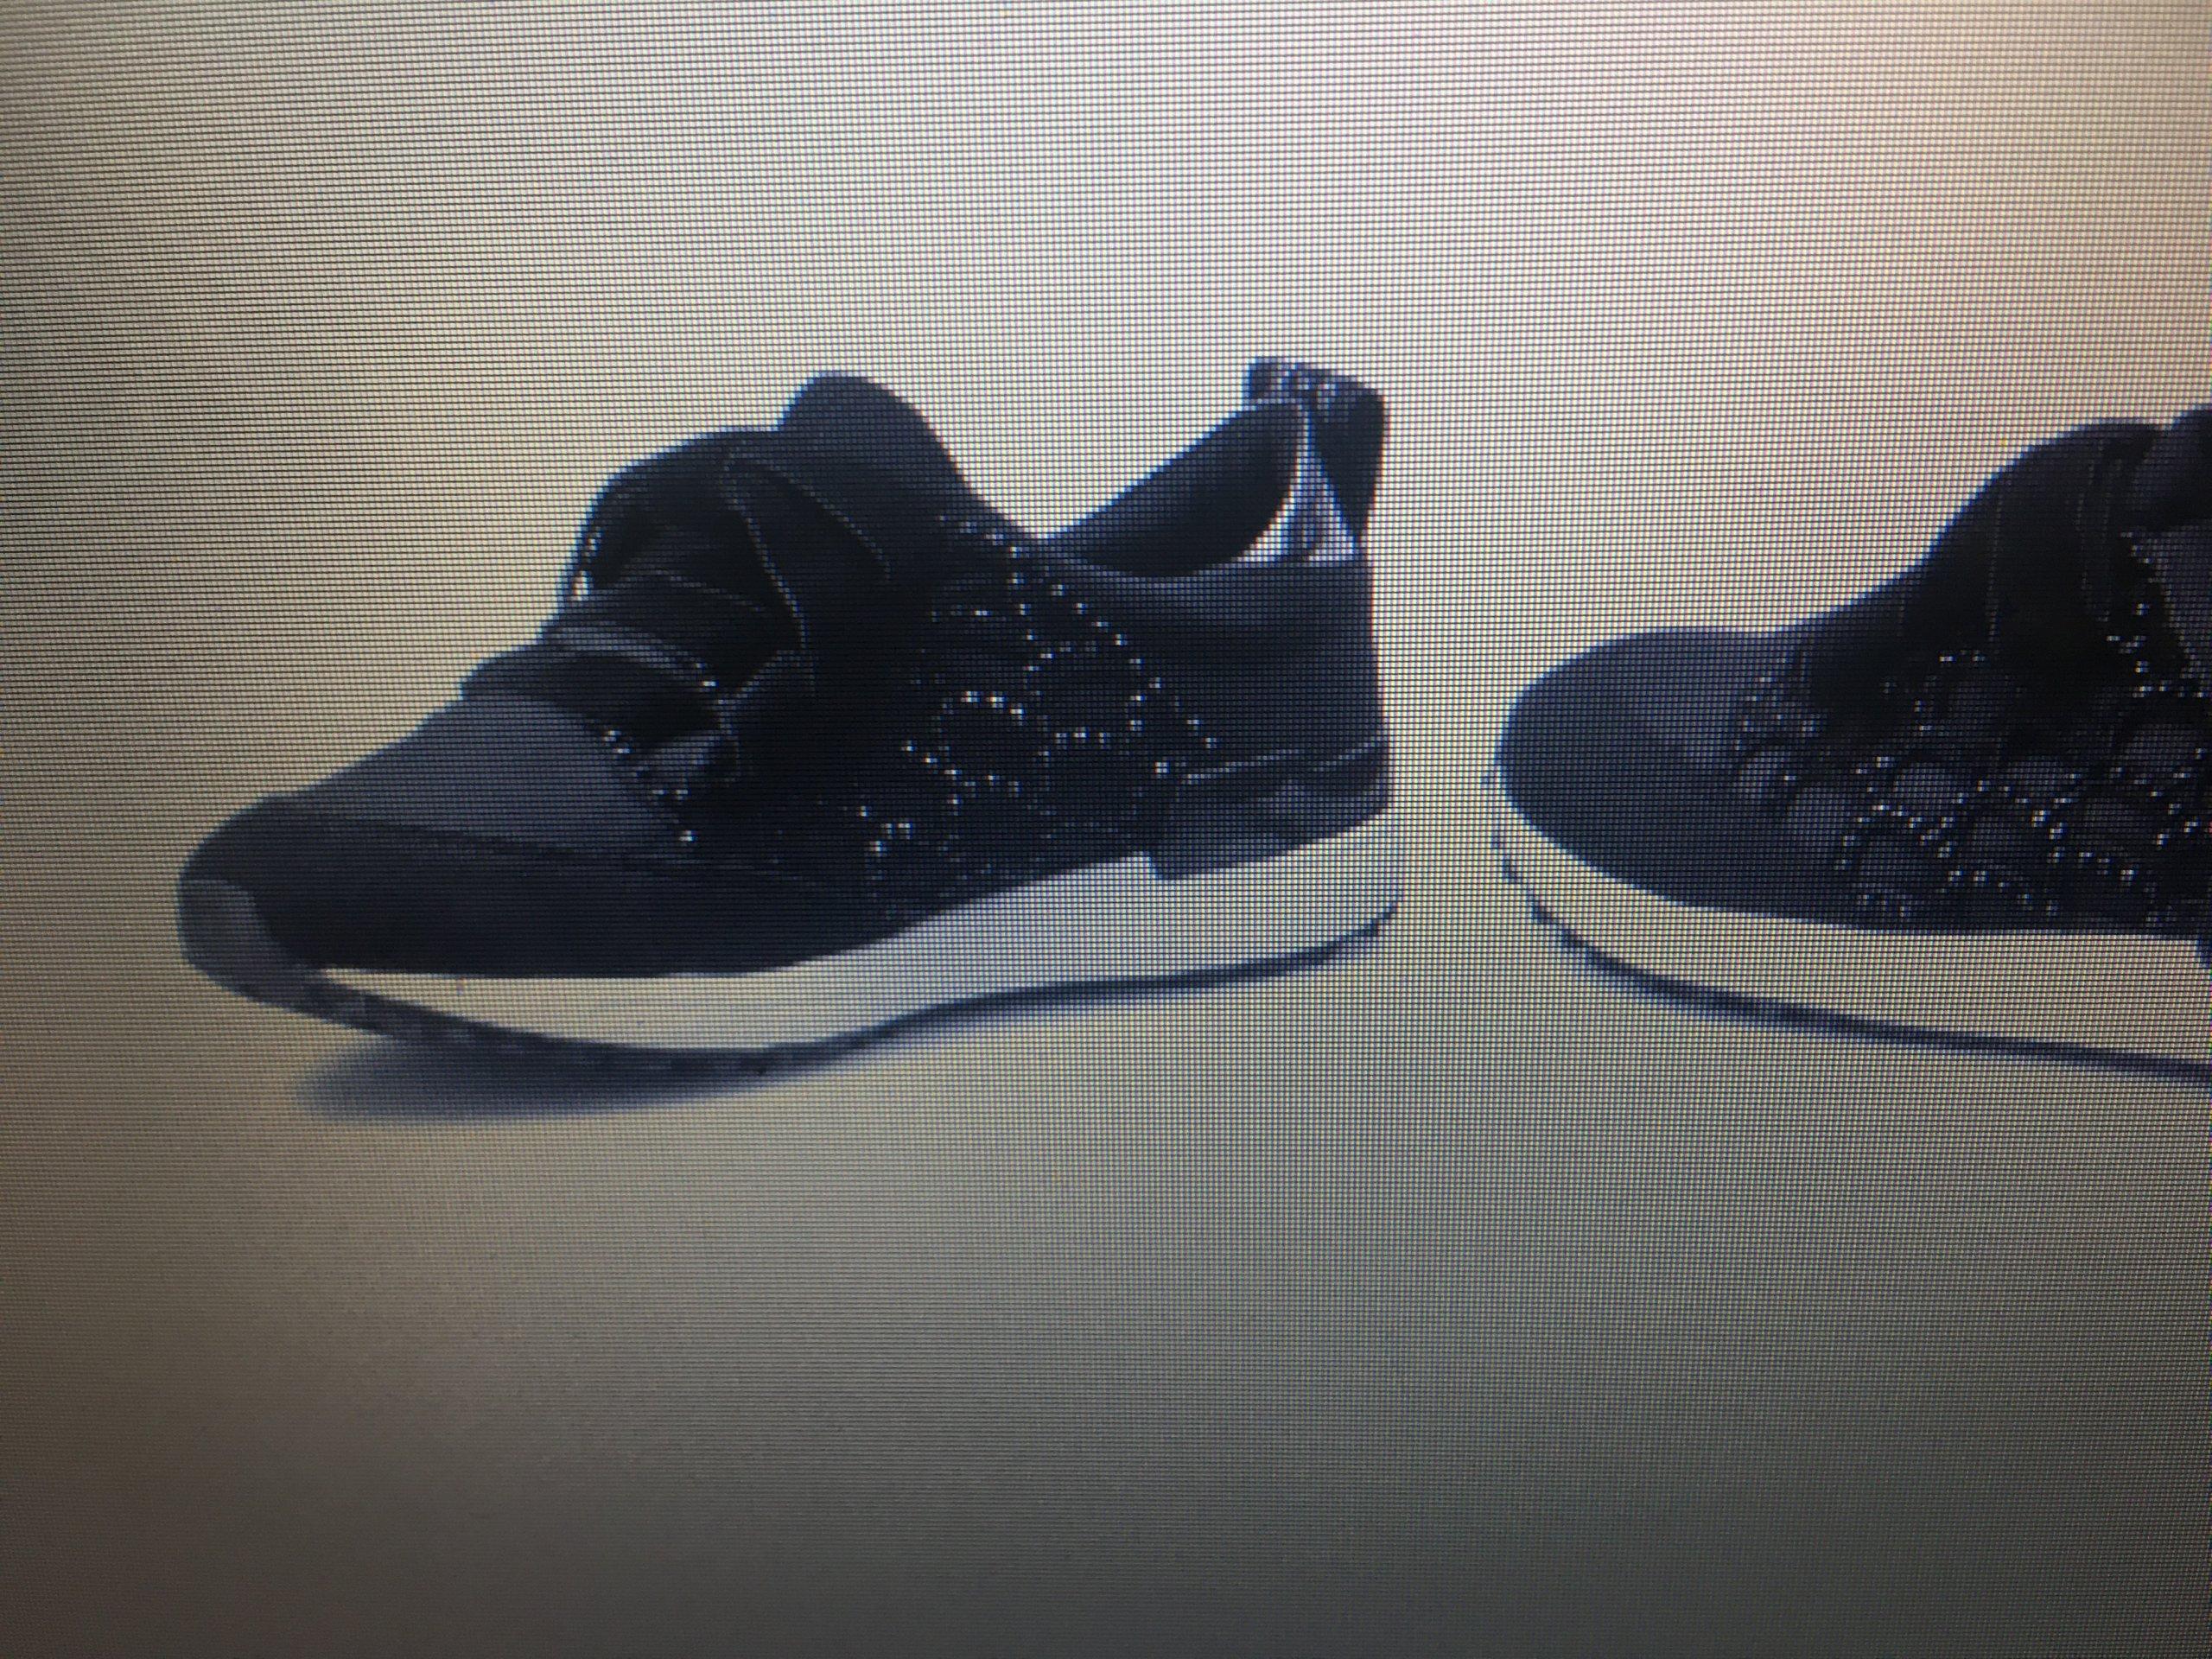 014cfc64bbde3 Liu jo czarne sneakers aura - 7178462912 - oficjalne archiwum allegro